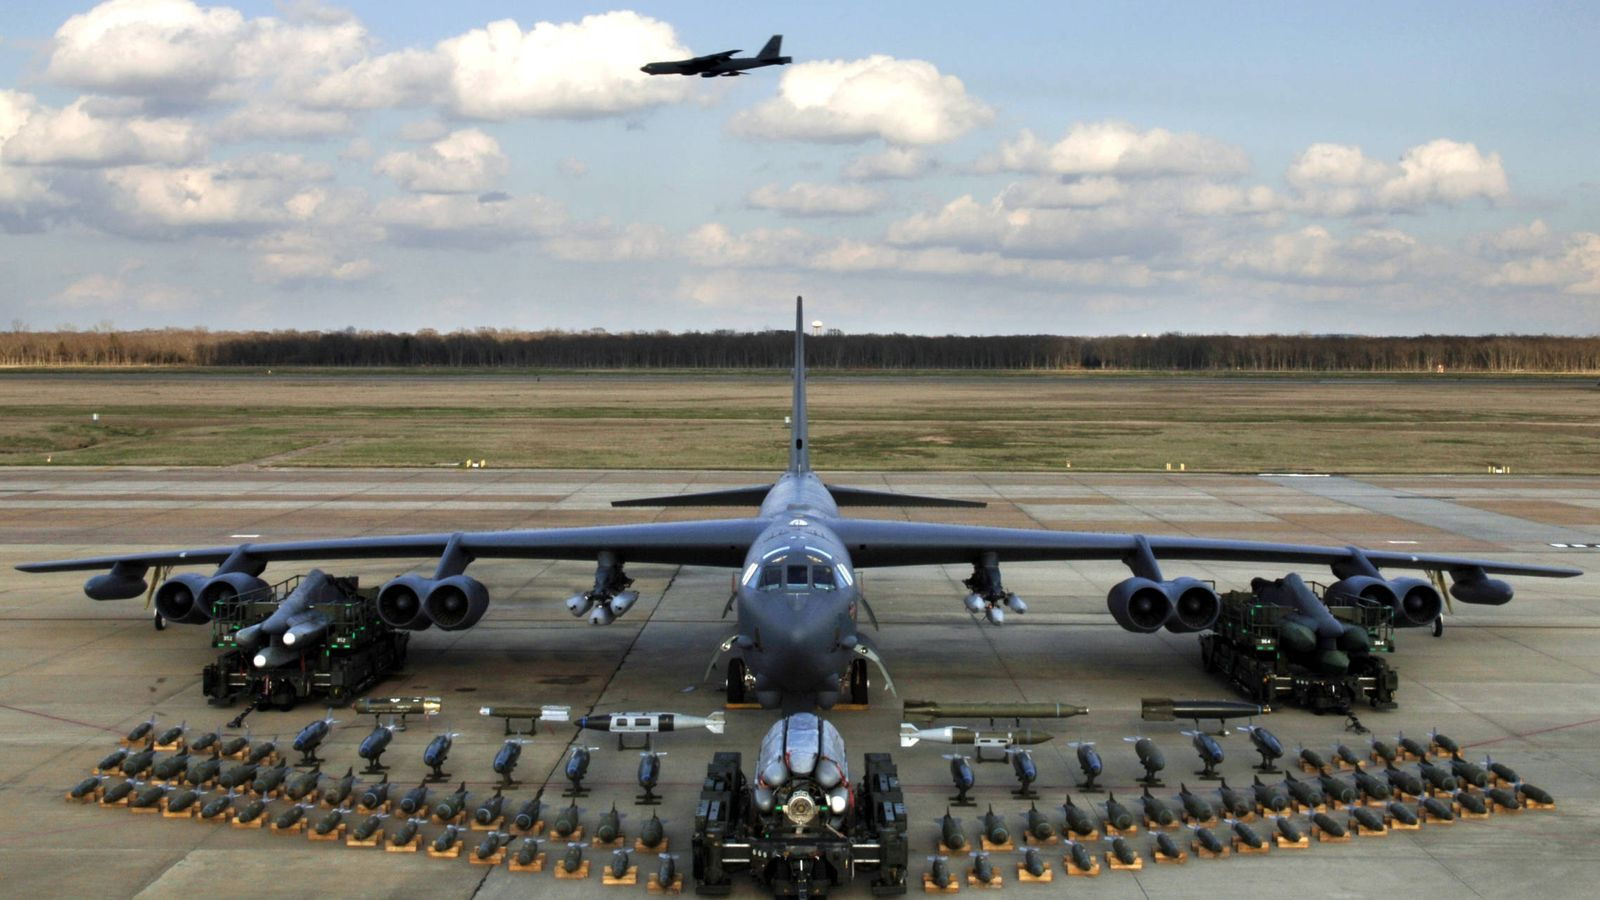 Foto: Espectácular capacidad de carga del B-52H (USAF)